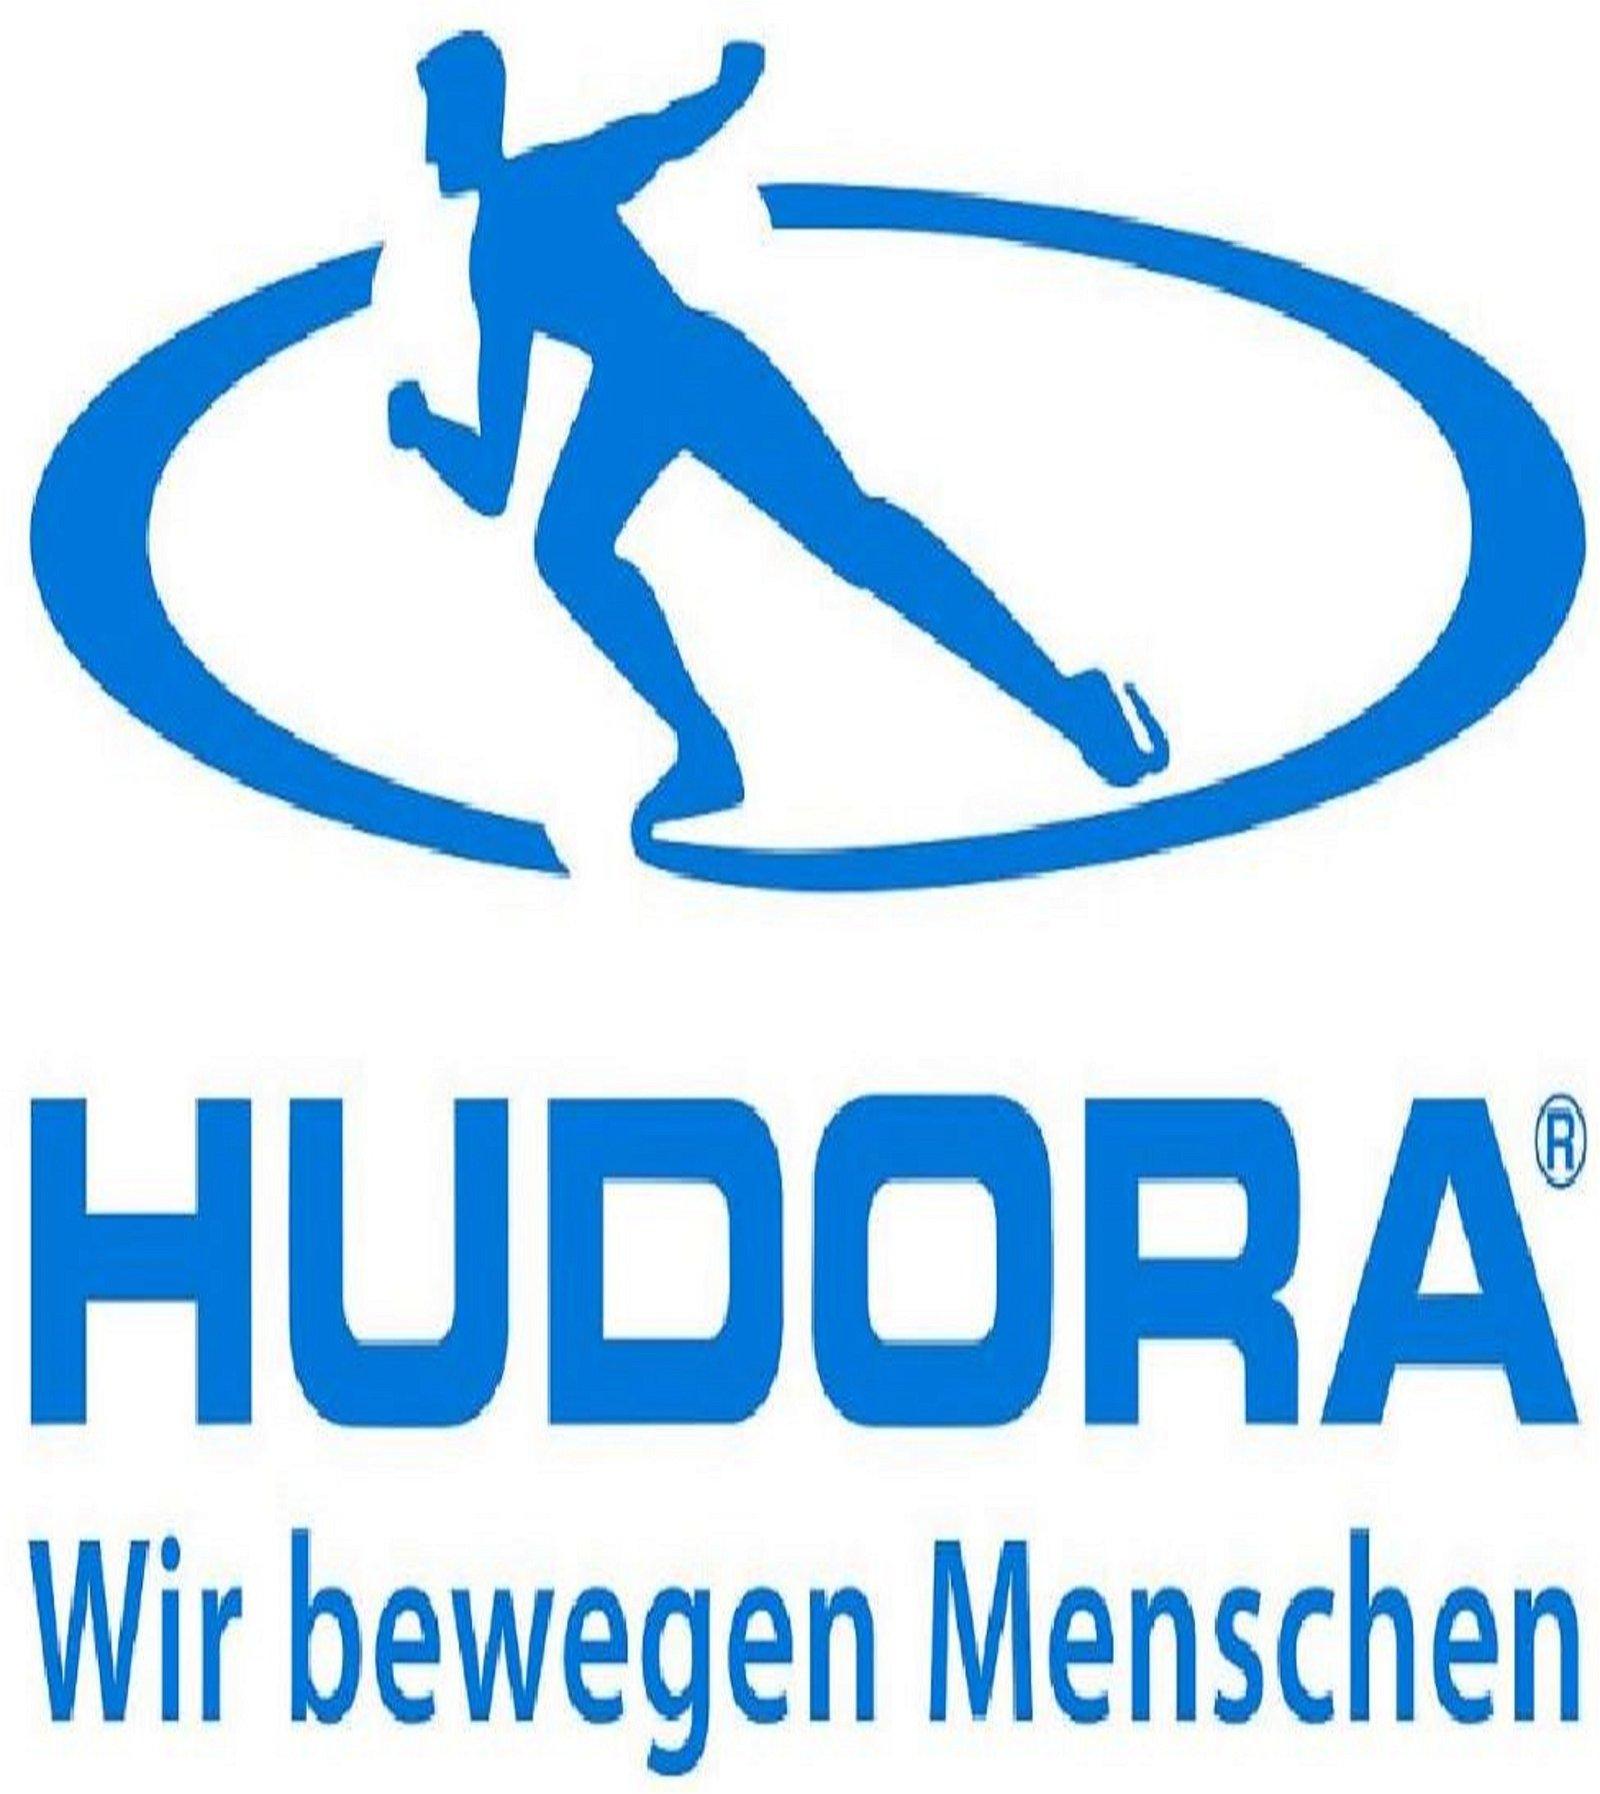 HUDORA